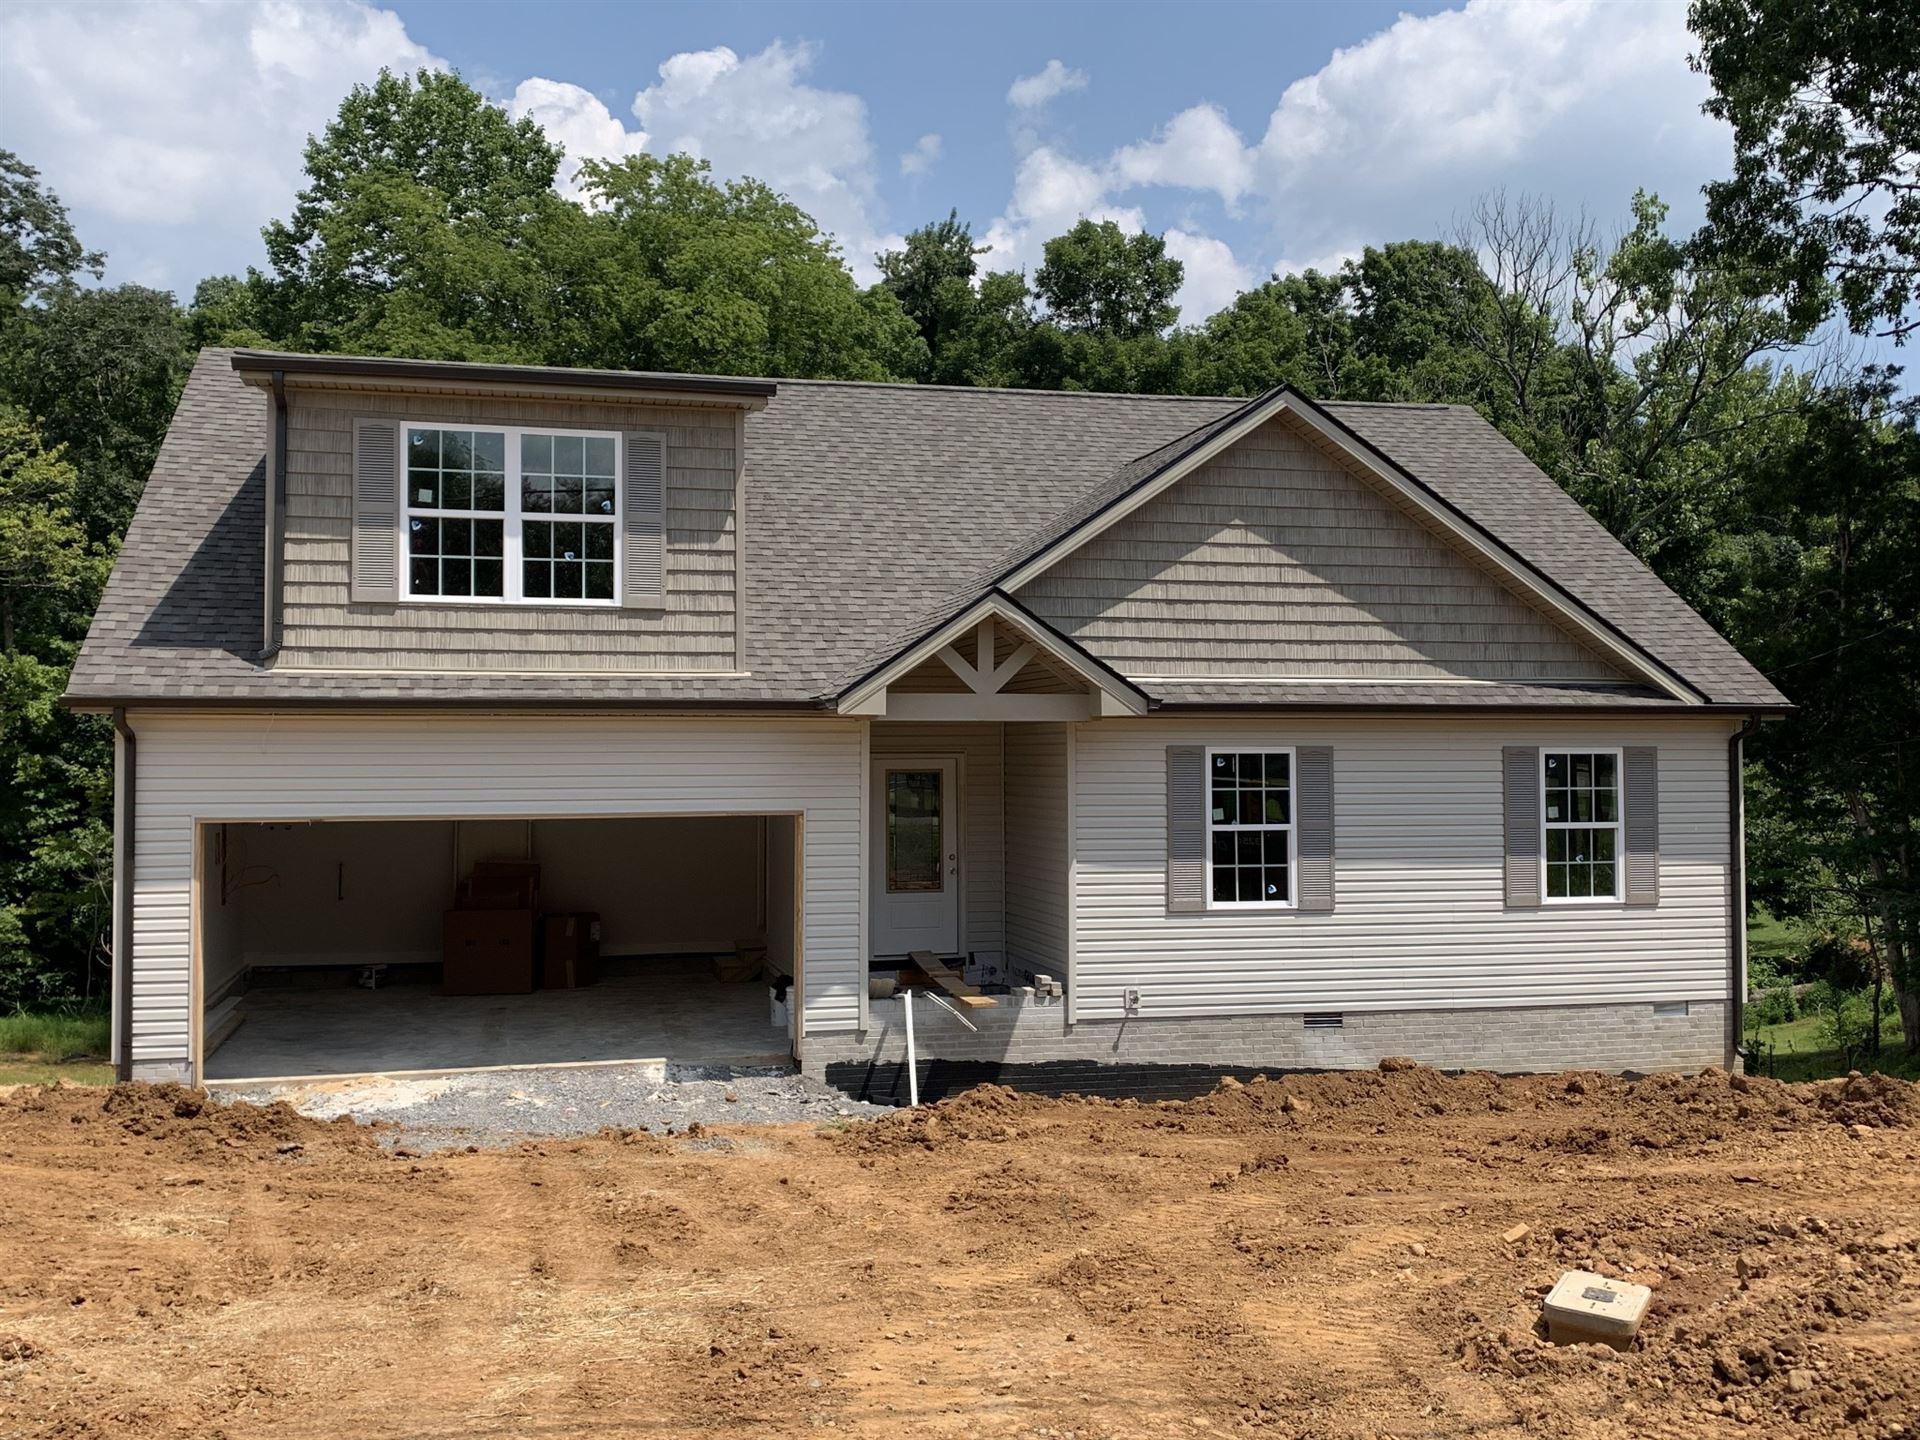 408 Hawkins Rd, Clarksville, TN 37040 - MLS#: 2277989